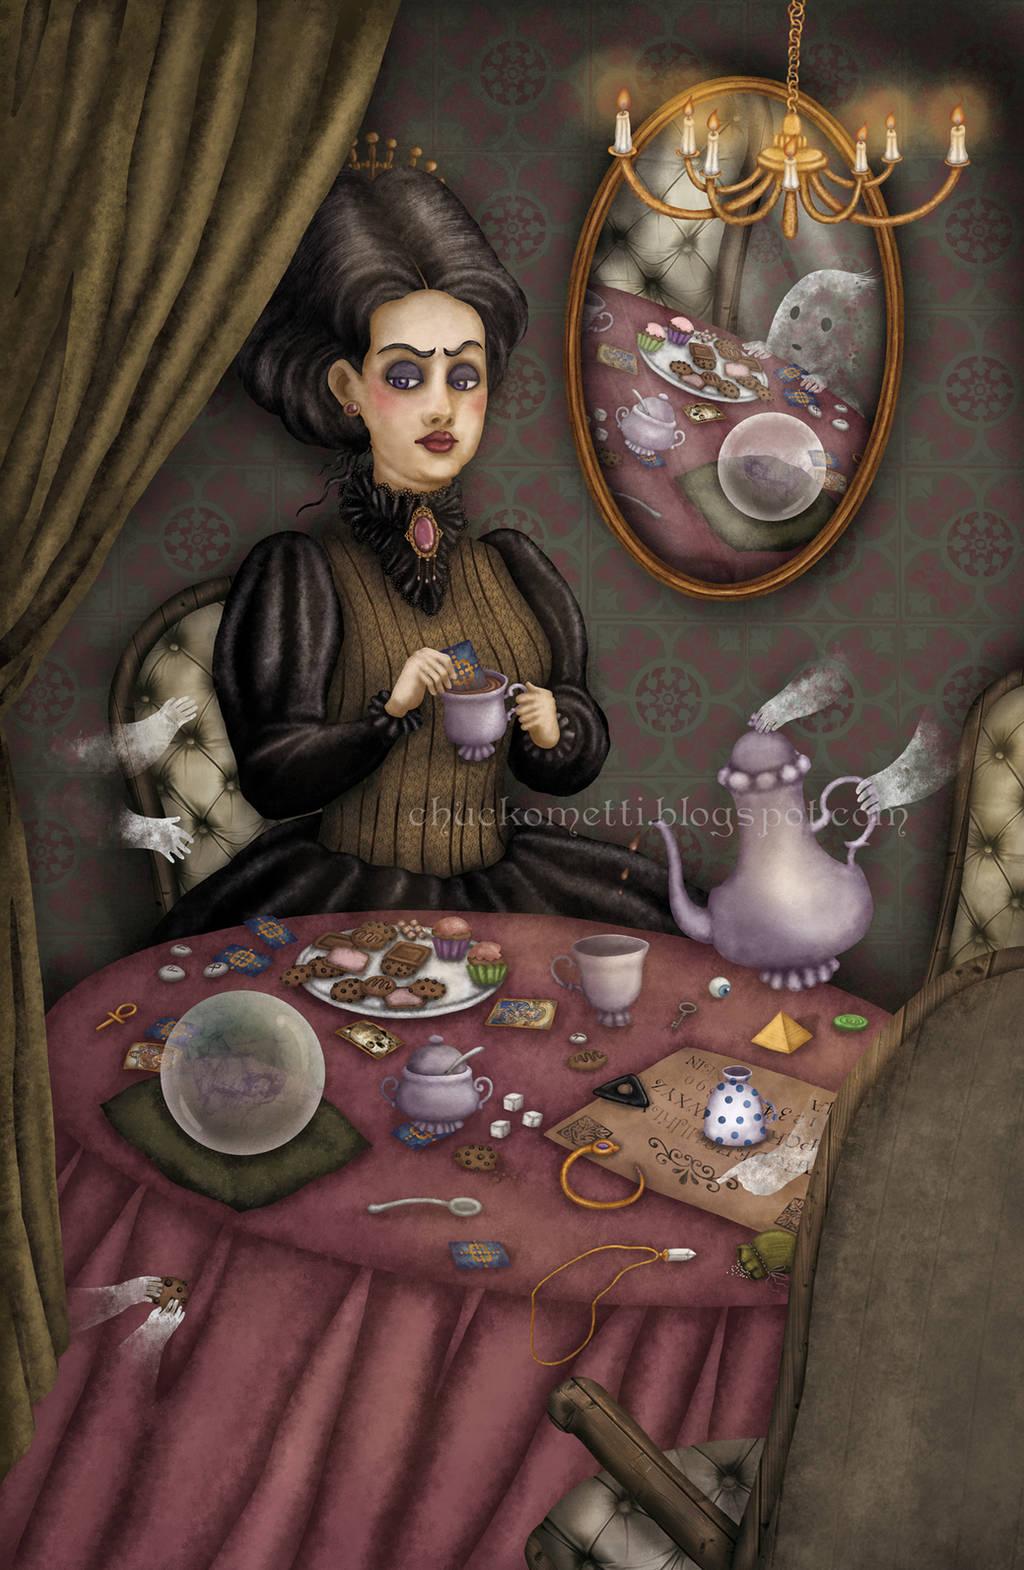 Madame Samovar by chuckometti